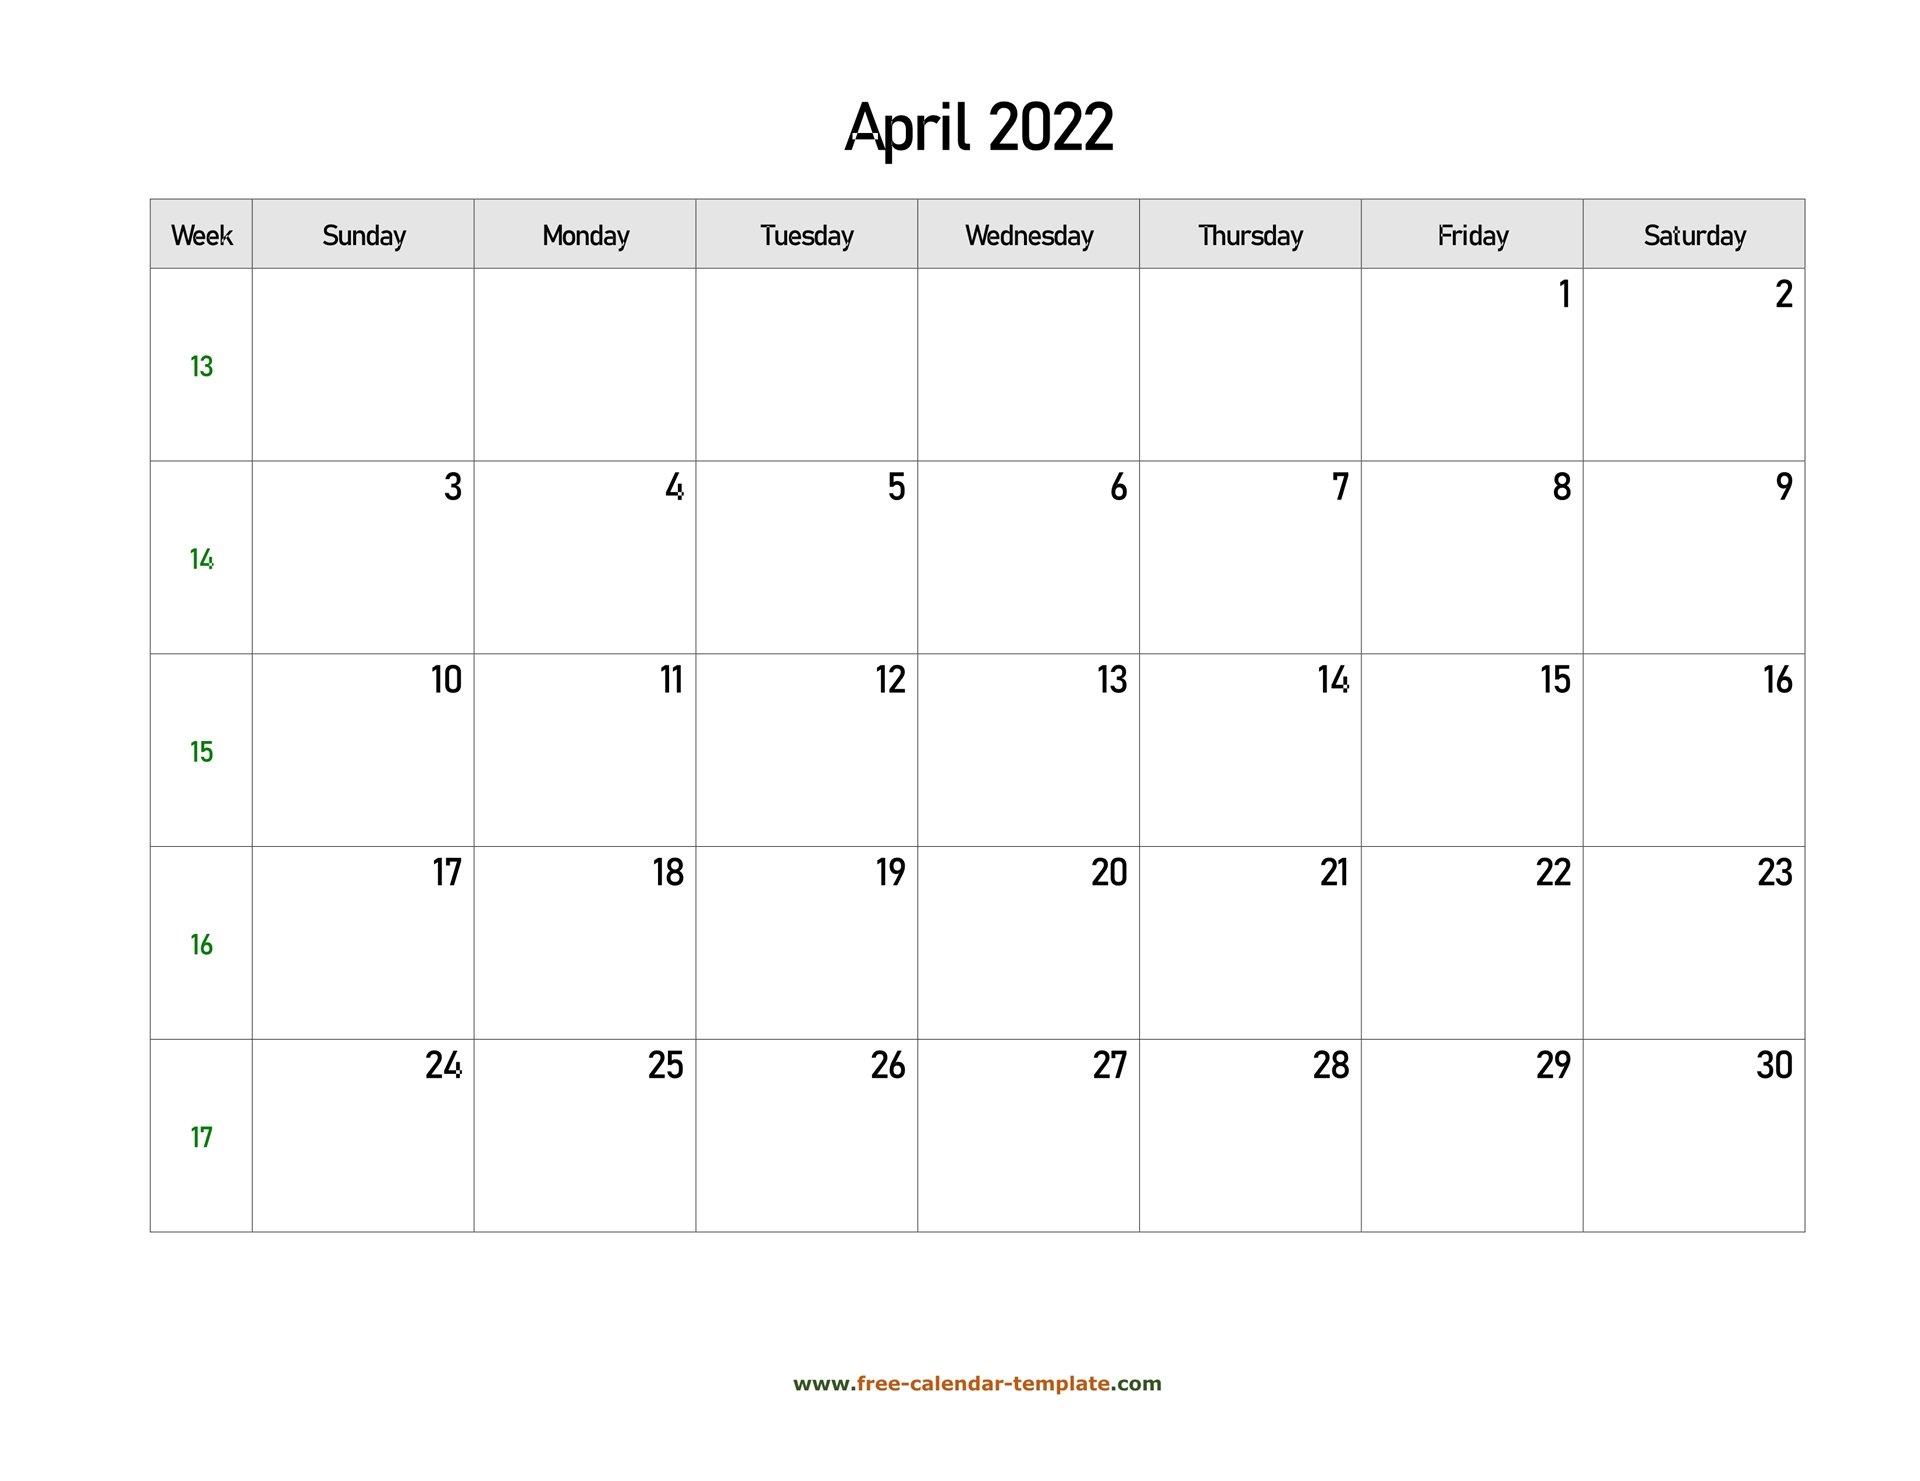 Free 2022 Calendar Blank April Template (Horizontal intended for April May Calendar 2022 Pdf